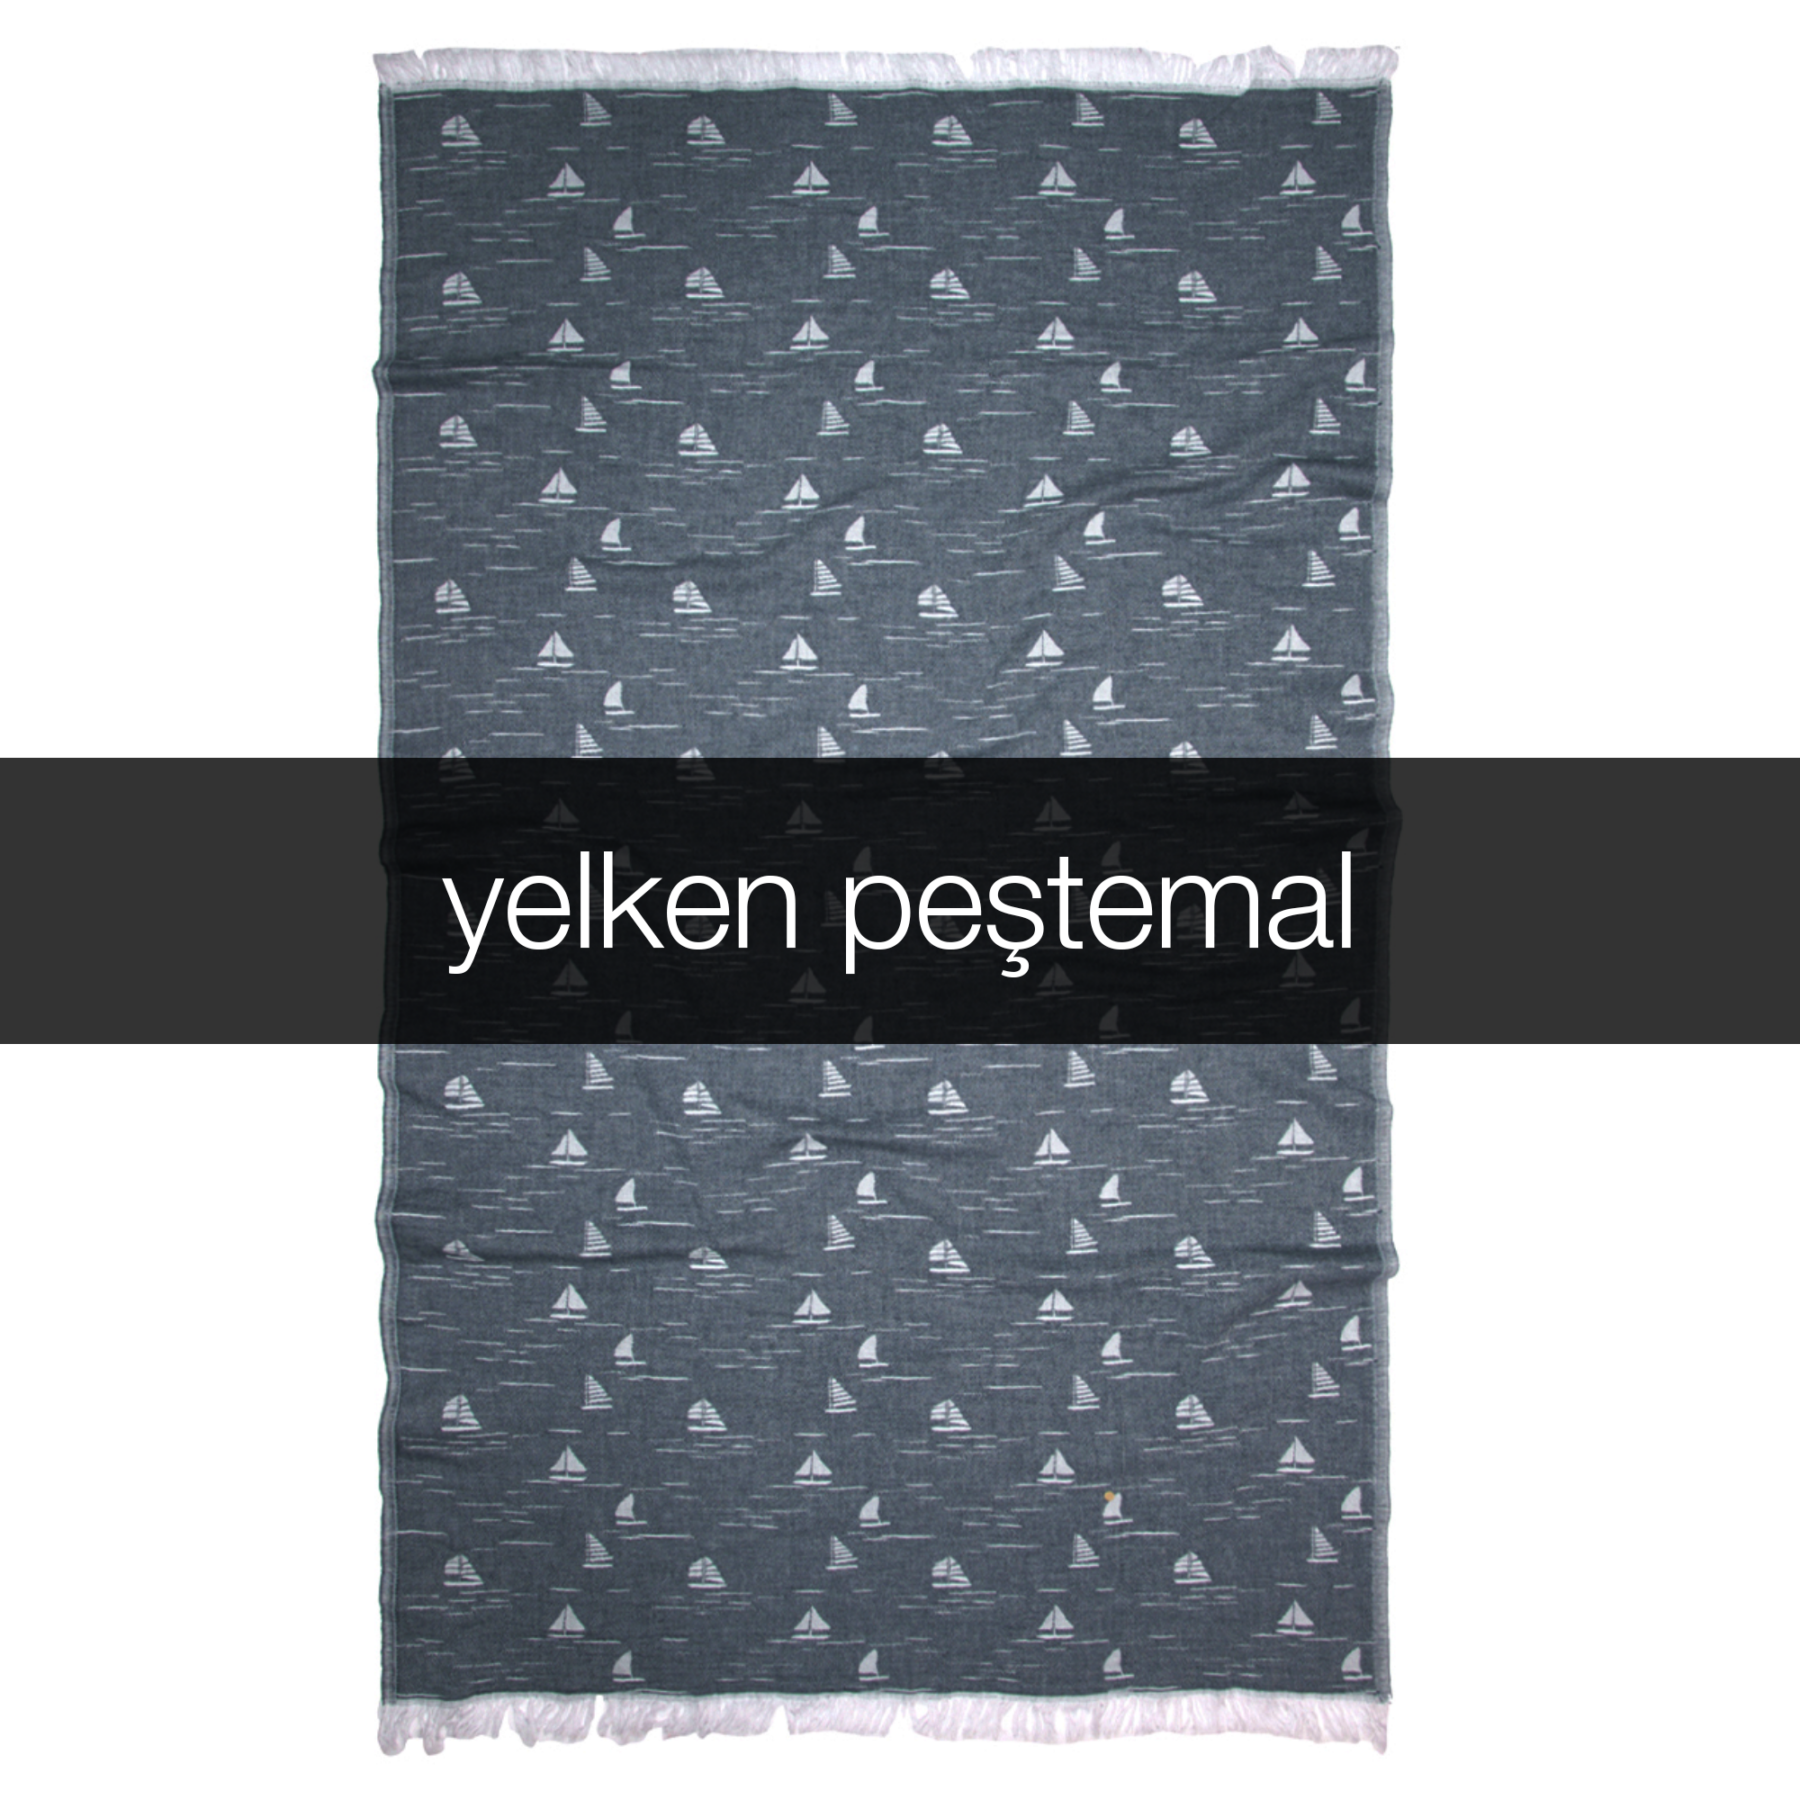 227465123-yelken-pestemal-square-0001